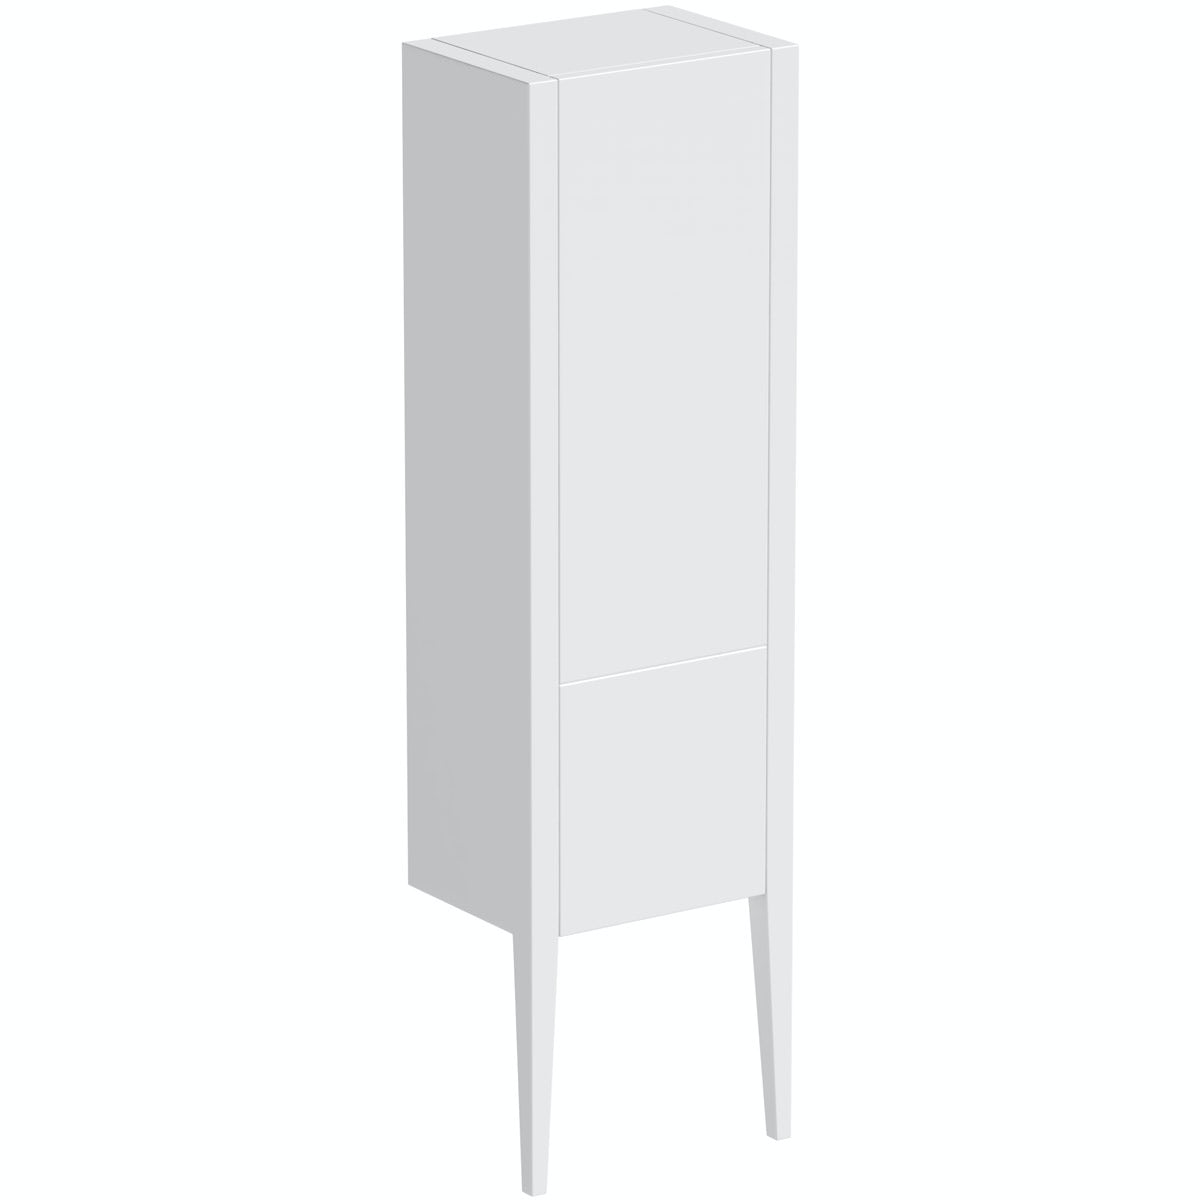 Mode Hale white gloss storage cabinet